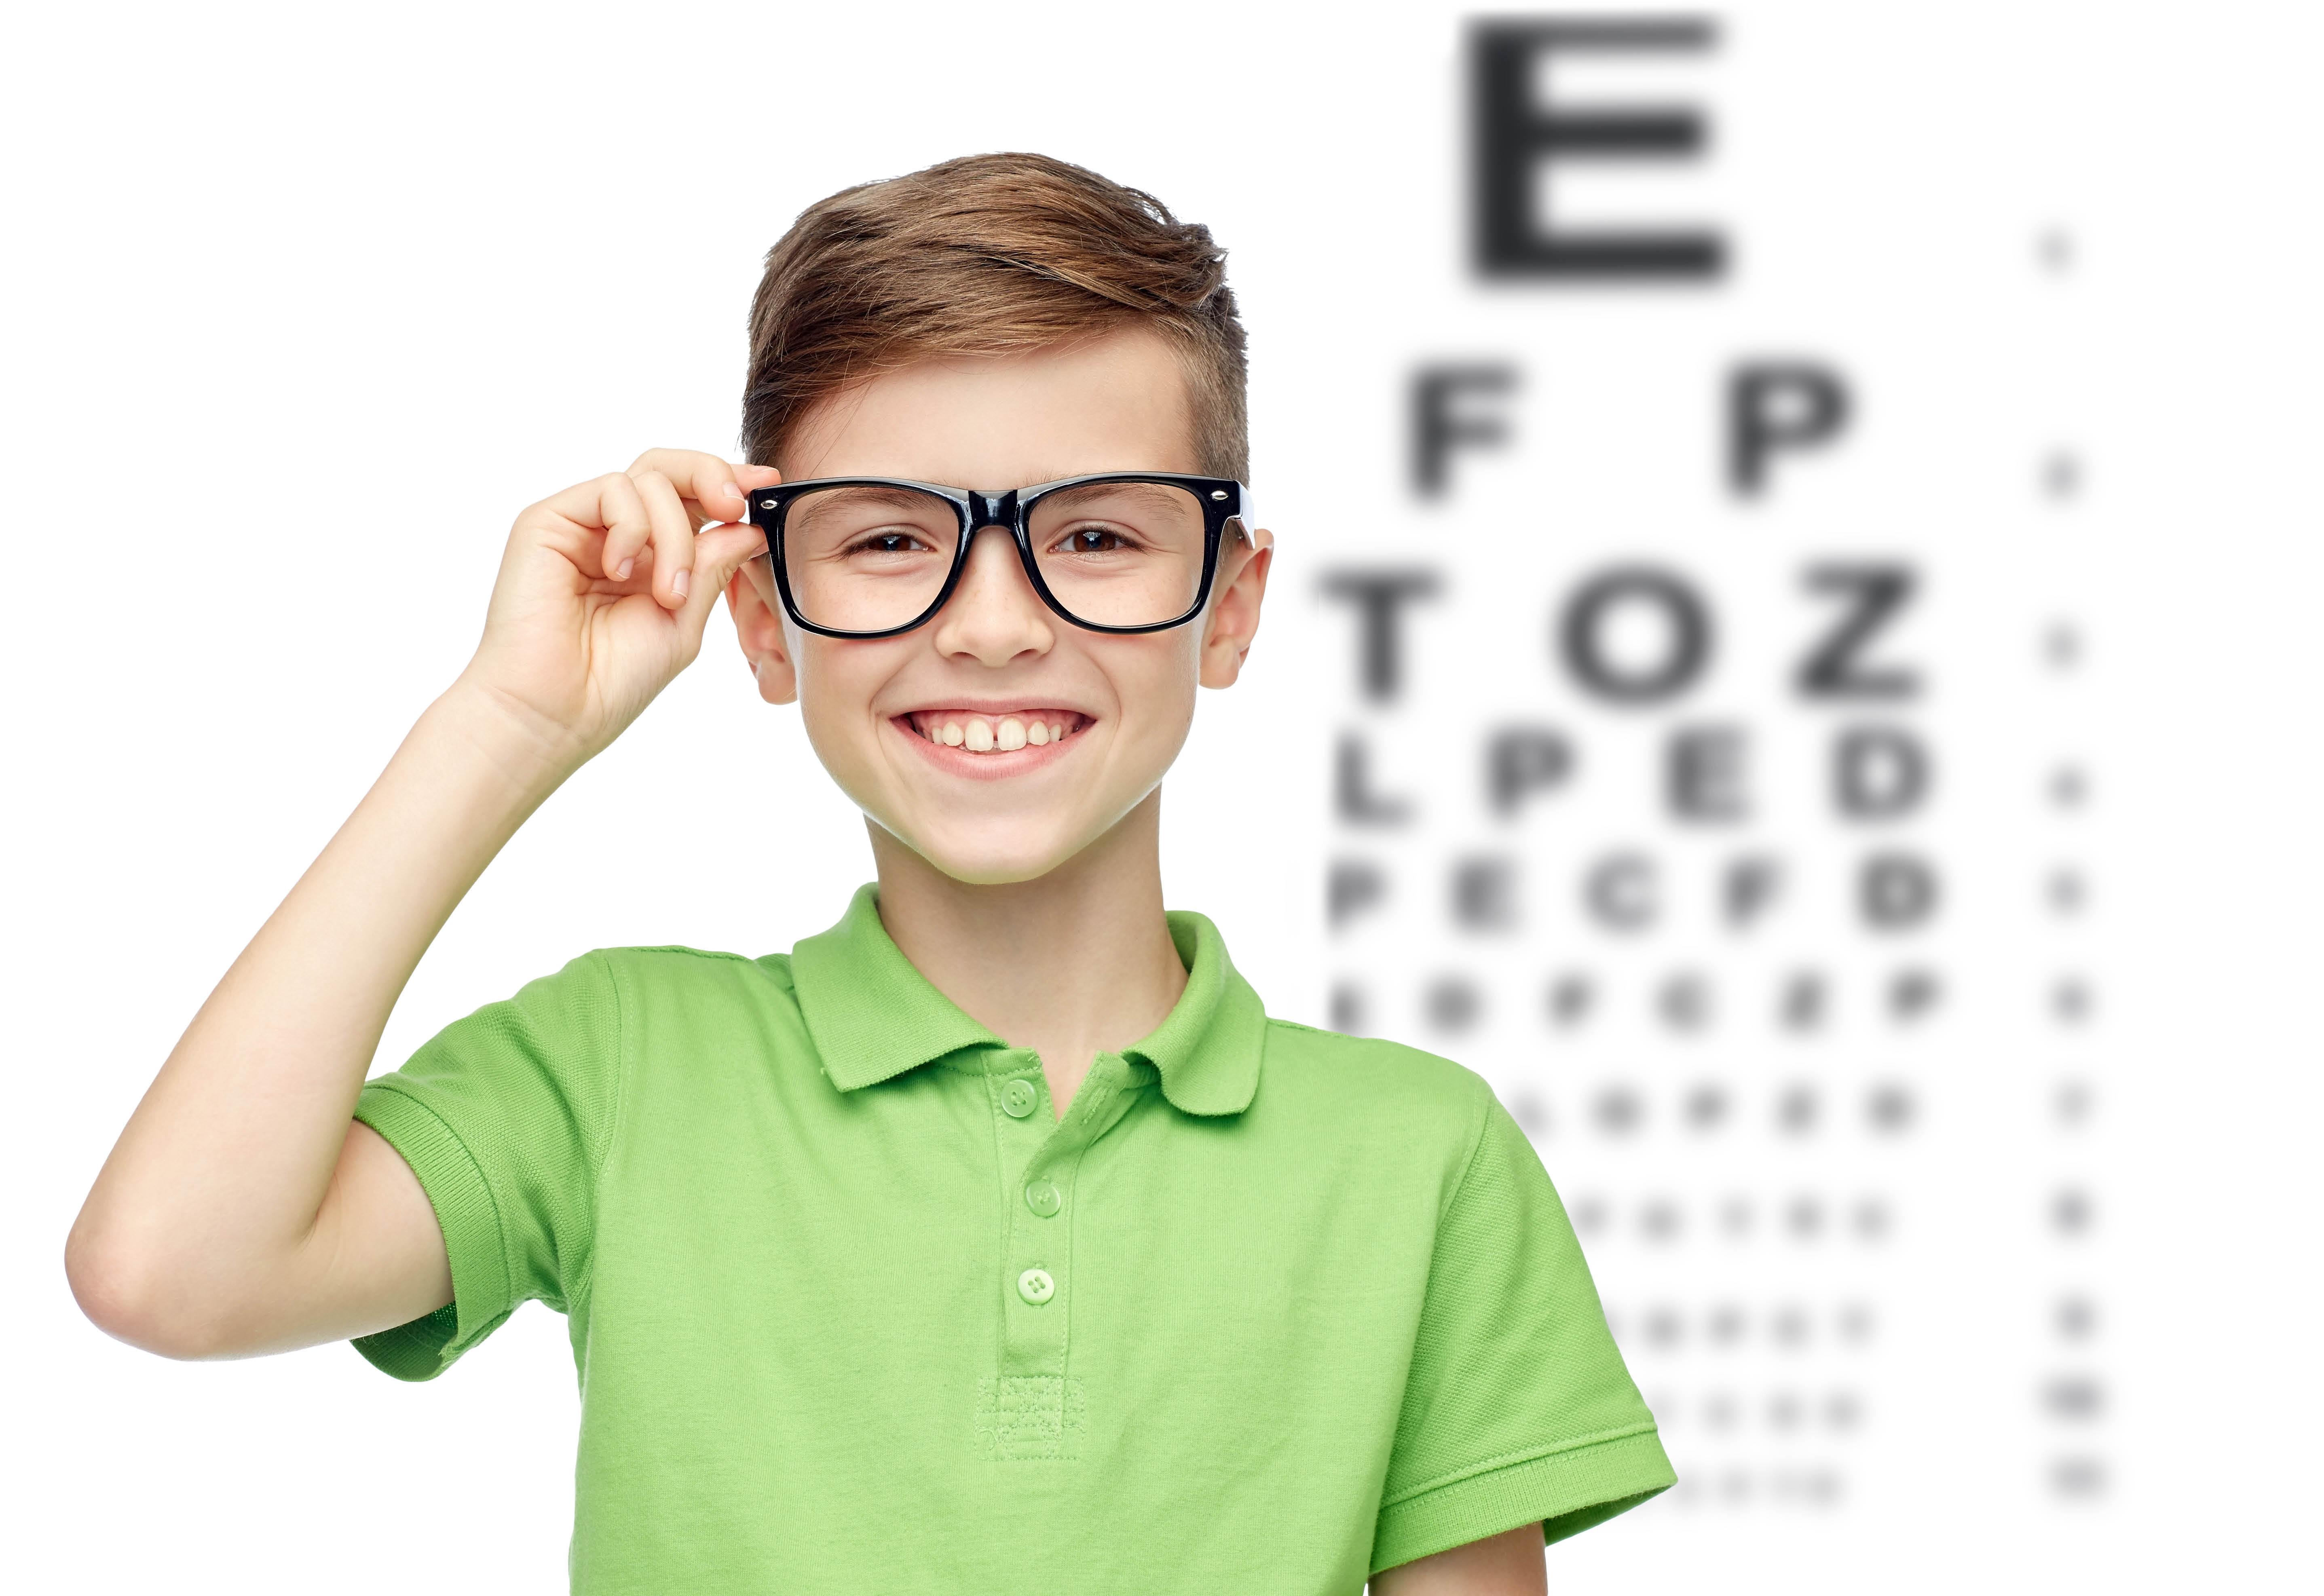 Paoli Opticians, paoli, optician, glasses, frames, glasses discount, coupon, valpak, vision, lenses, Digital Lenses, Transitions, Premium Anti Reflective Coating, Fashion Frames